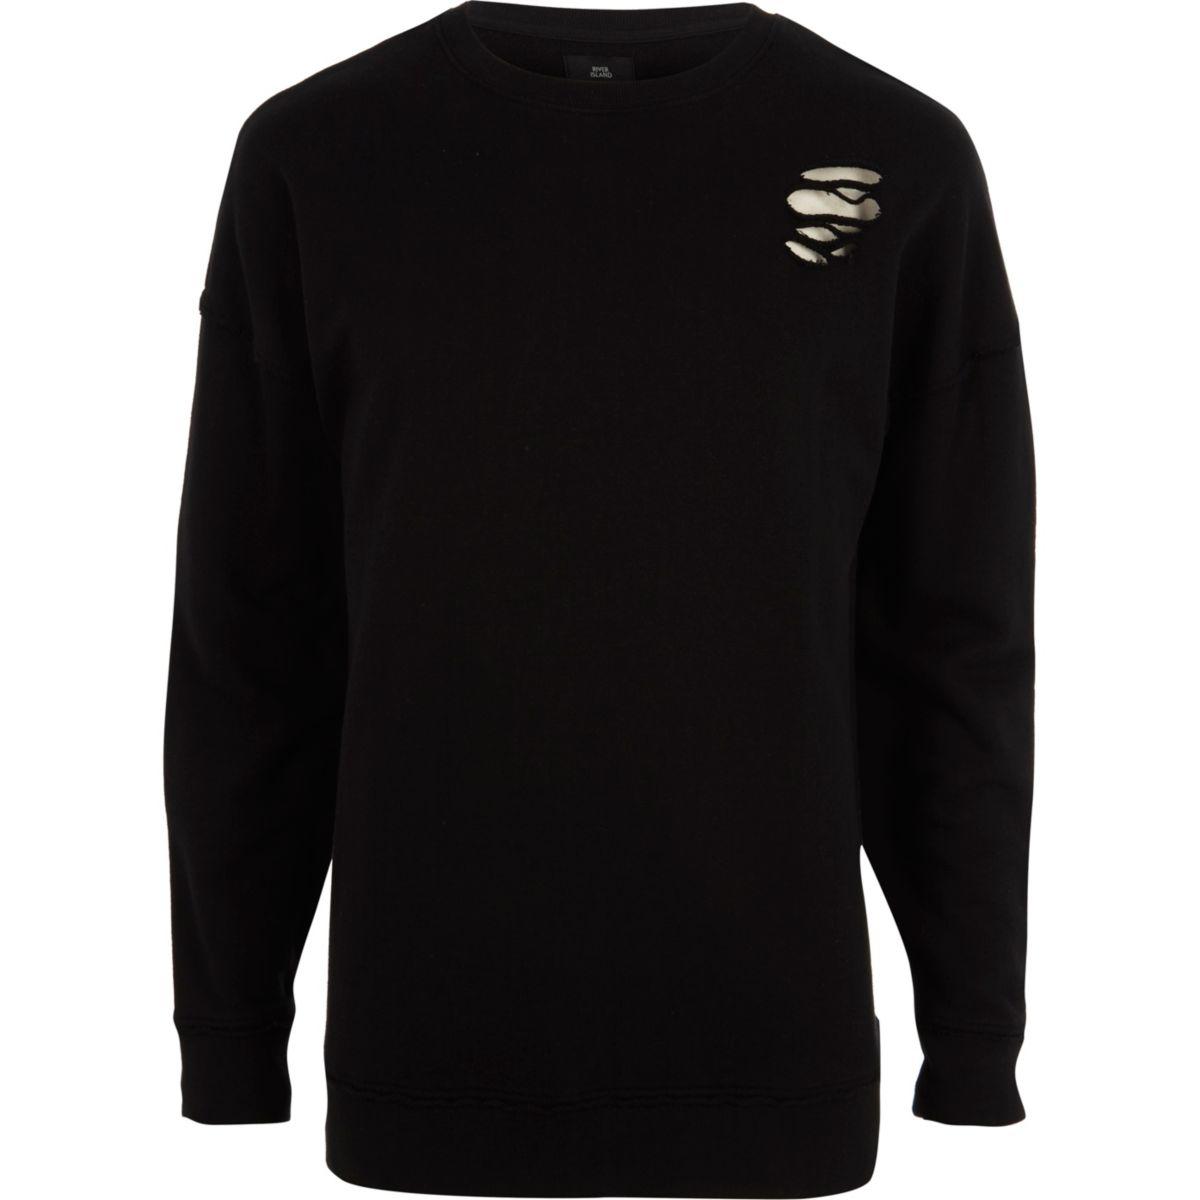 Black ripped oversized sweatshirt